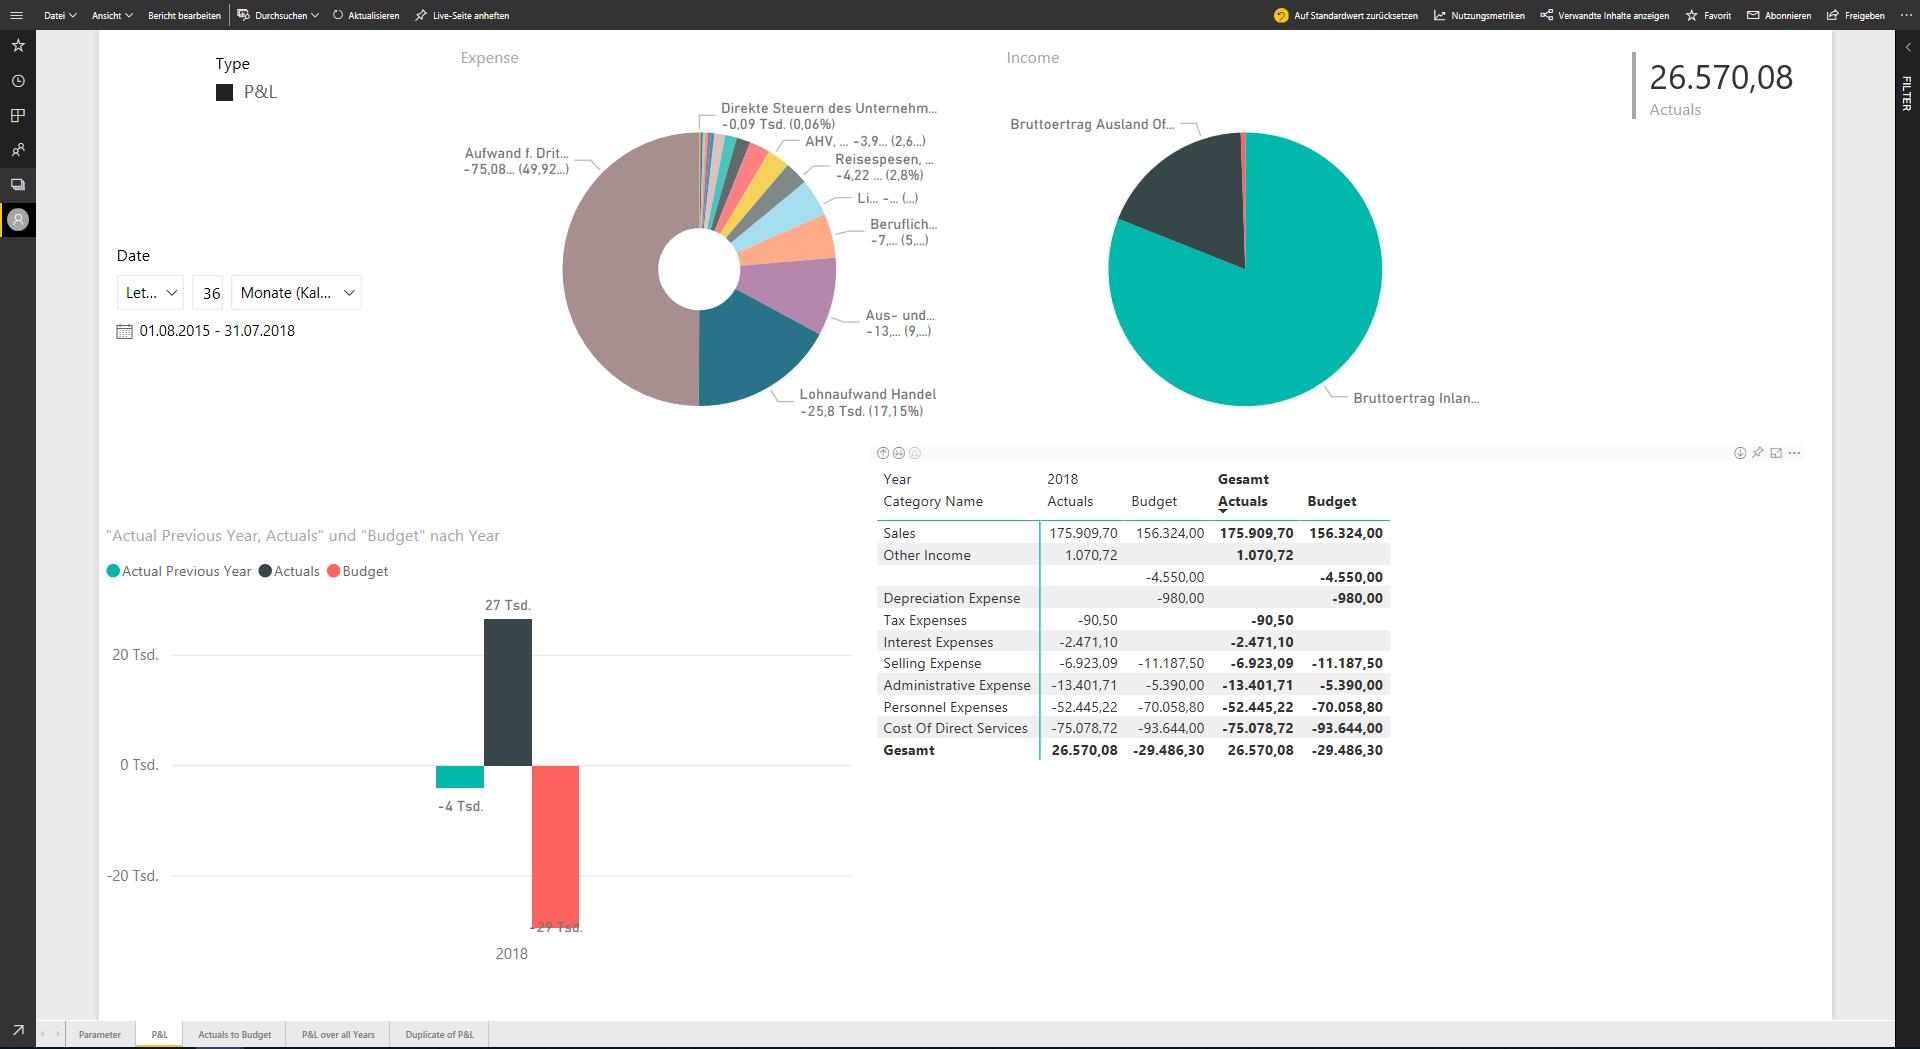 Financial Reporting interactive and realtime - AMAGNO und Activ-Accounting: Rechnungswesen und Dokumentenmanagement in der Cloud